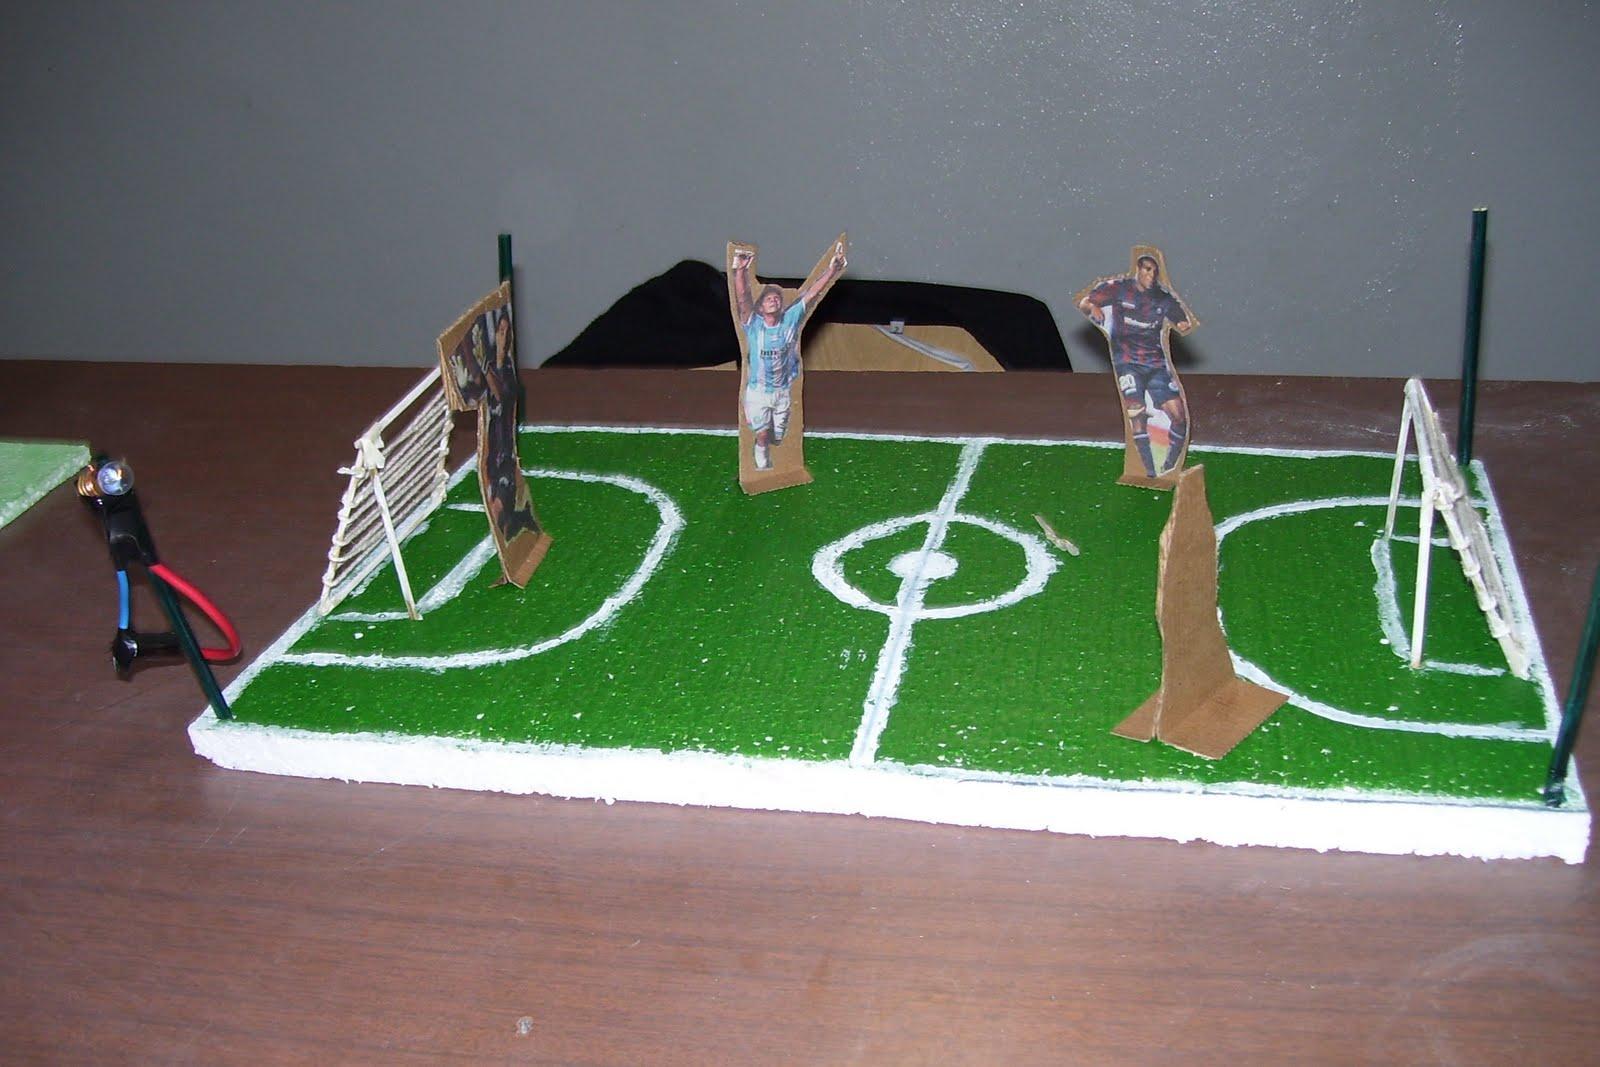 maqueta de una cancha de futbol YouTube - Imagenes De Maquetas De Canchas De Futbol